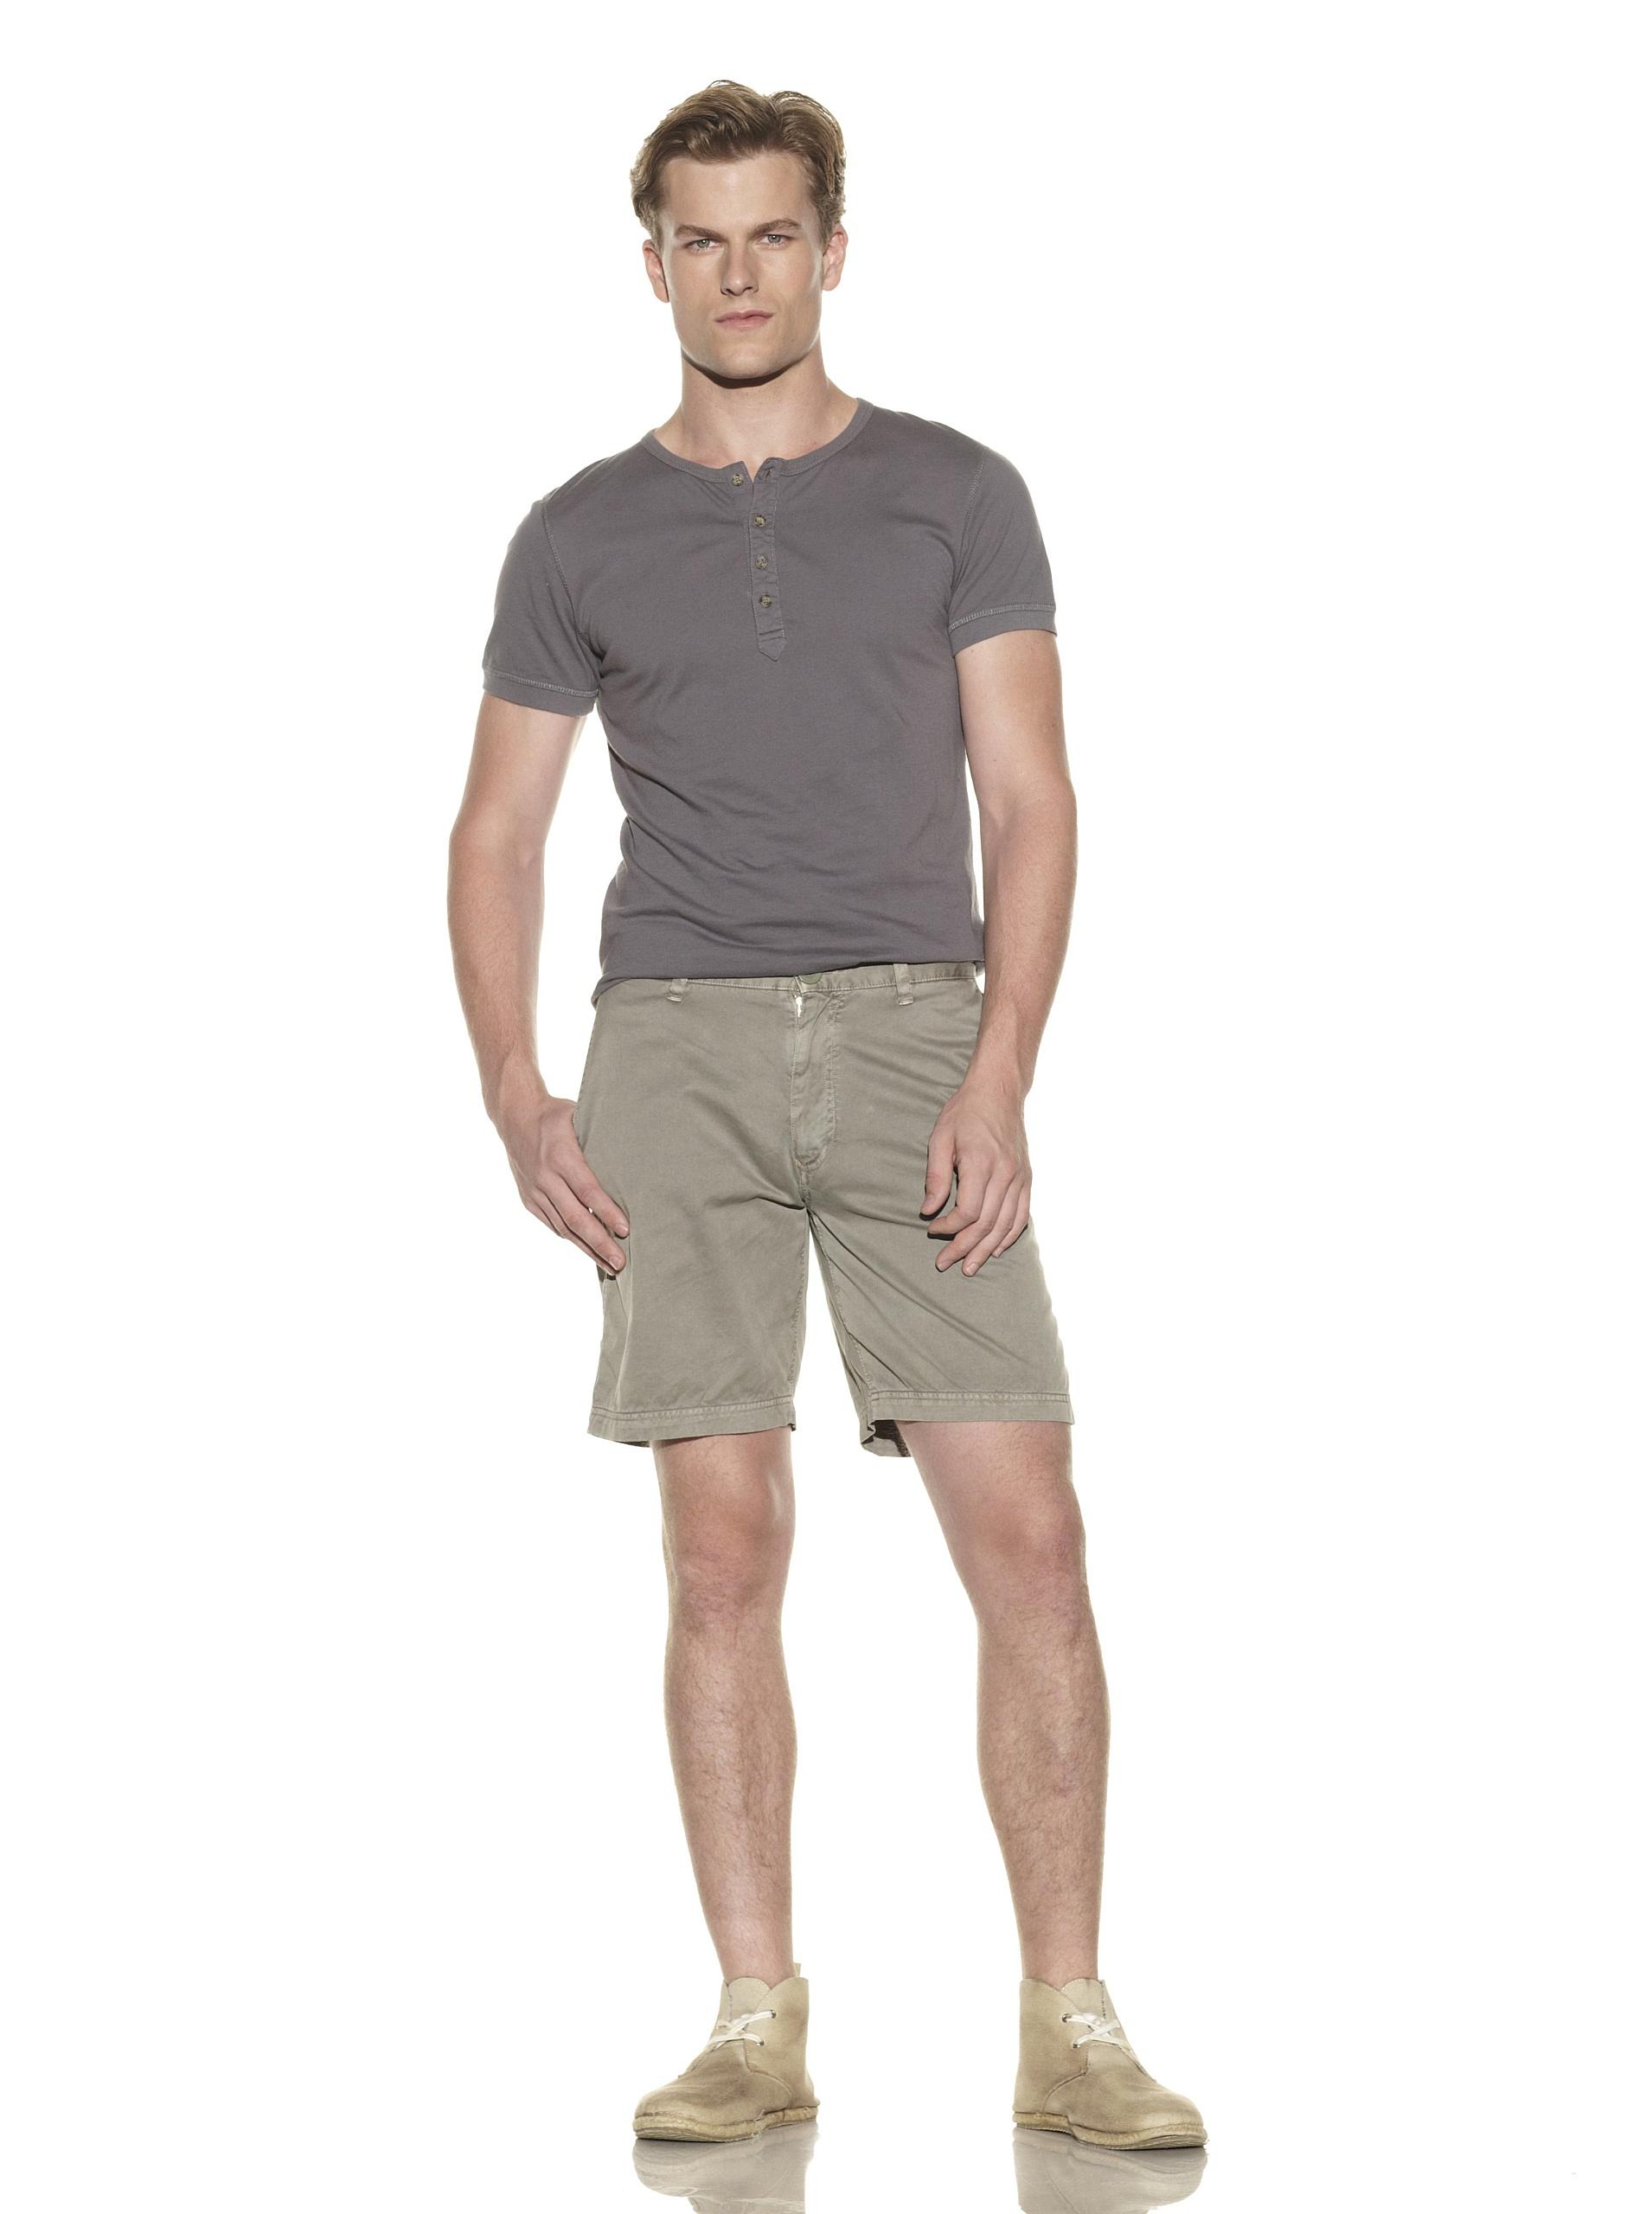 nüco Men's Twill Shorts (Olive)